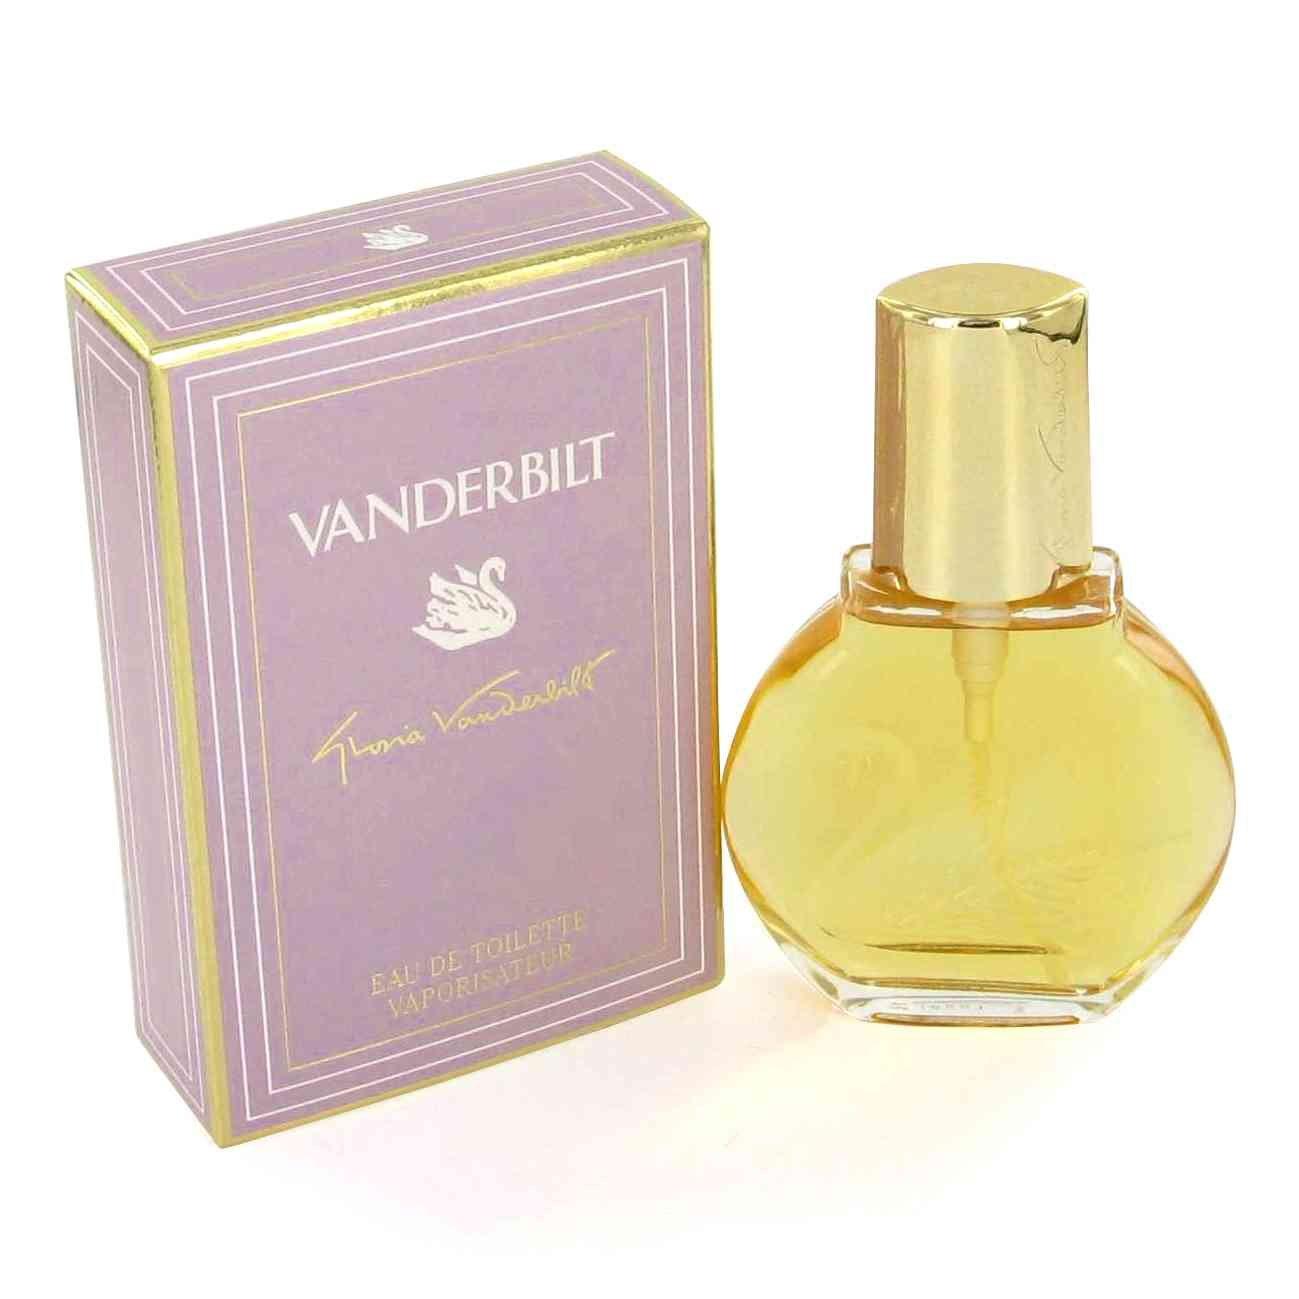 VANDERBILT by Gloria Vanderbilt, Eau De Toilette Spray 3.4 oz, Women